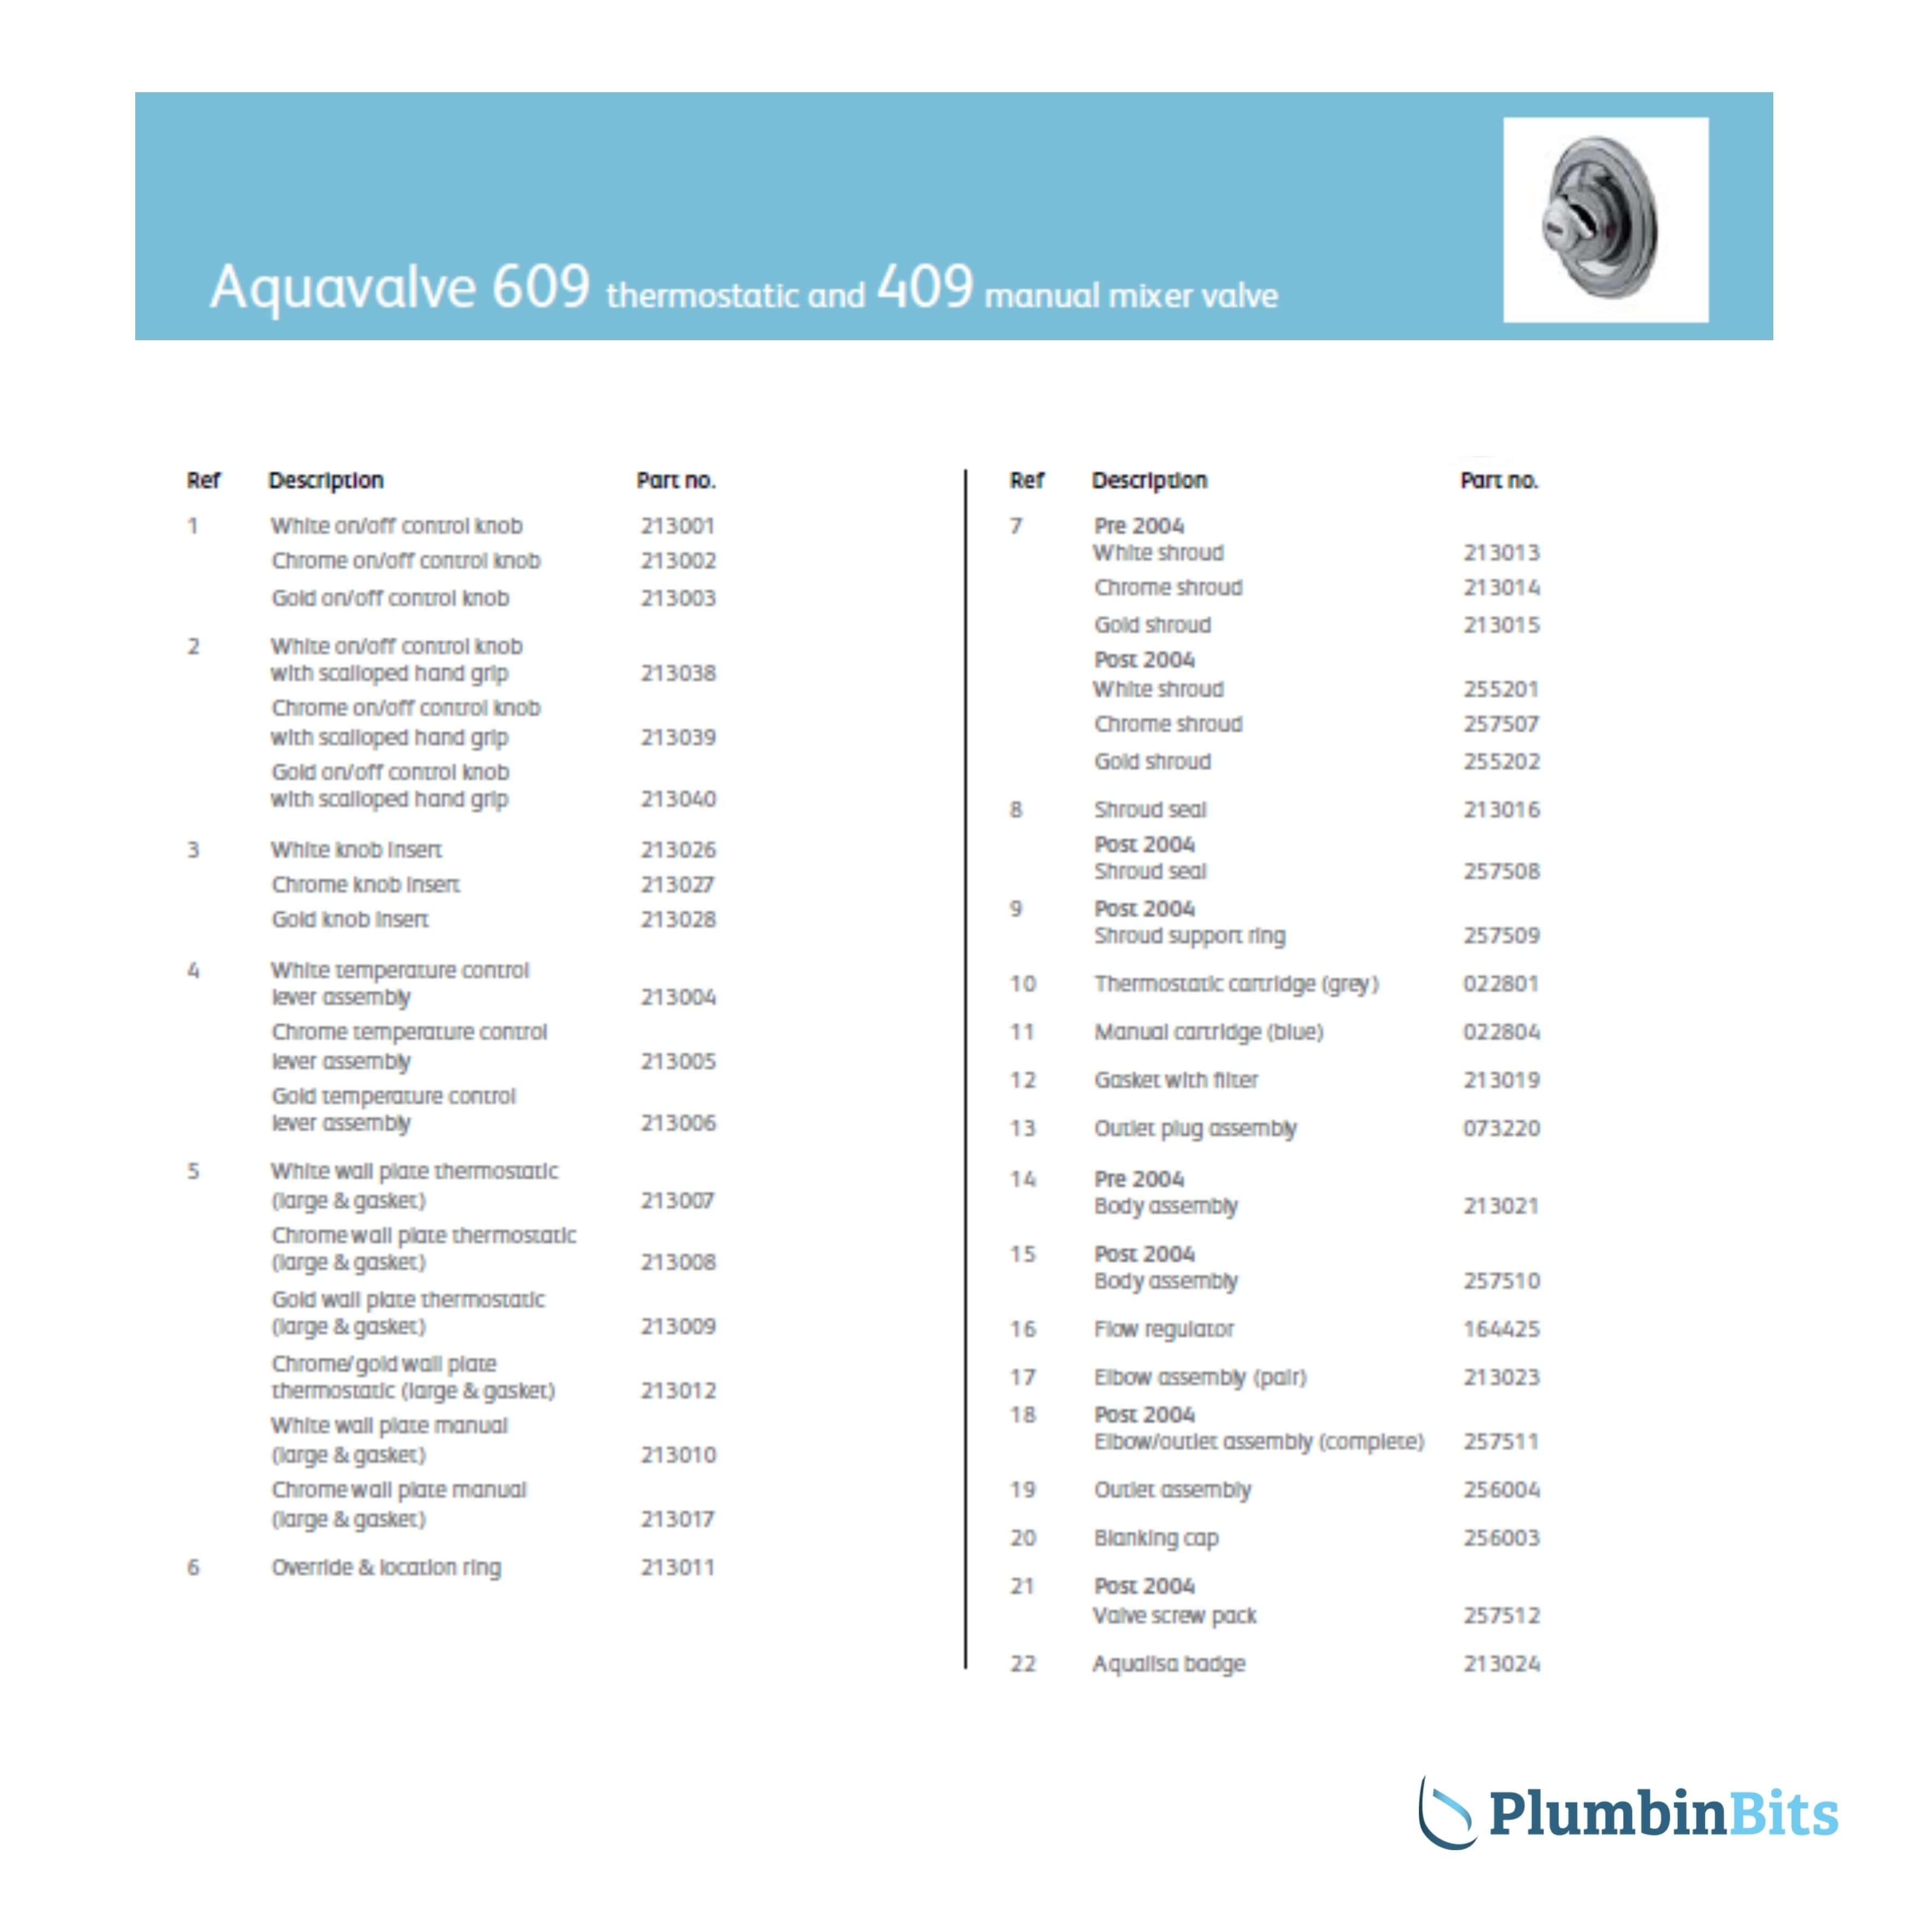 Aqualisa 609 Parts List